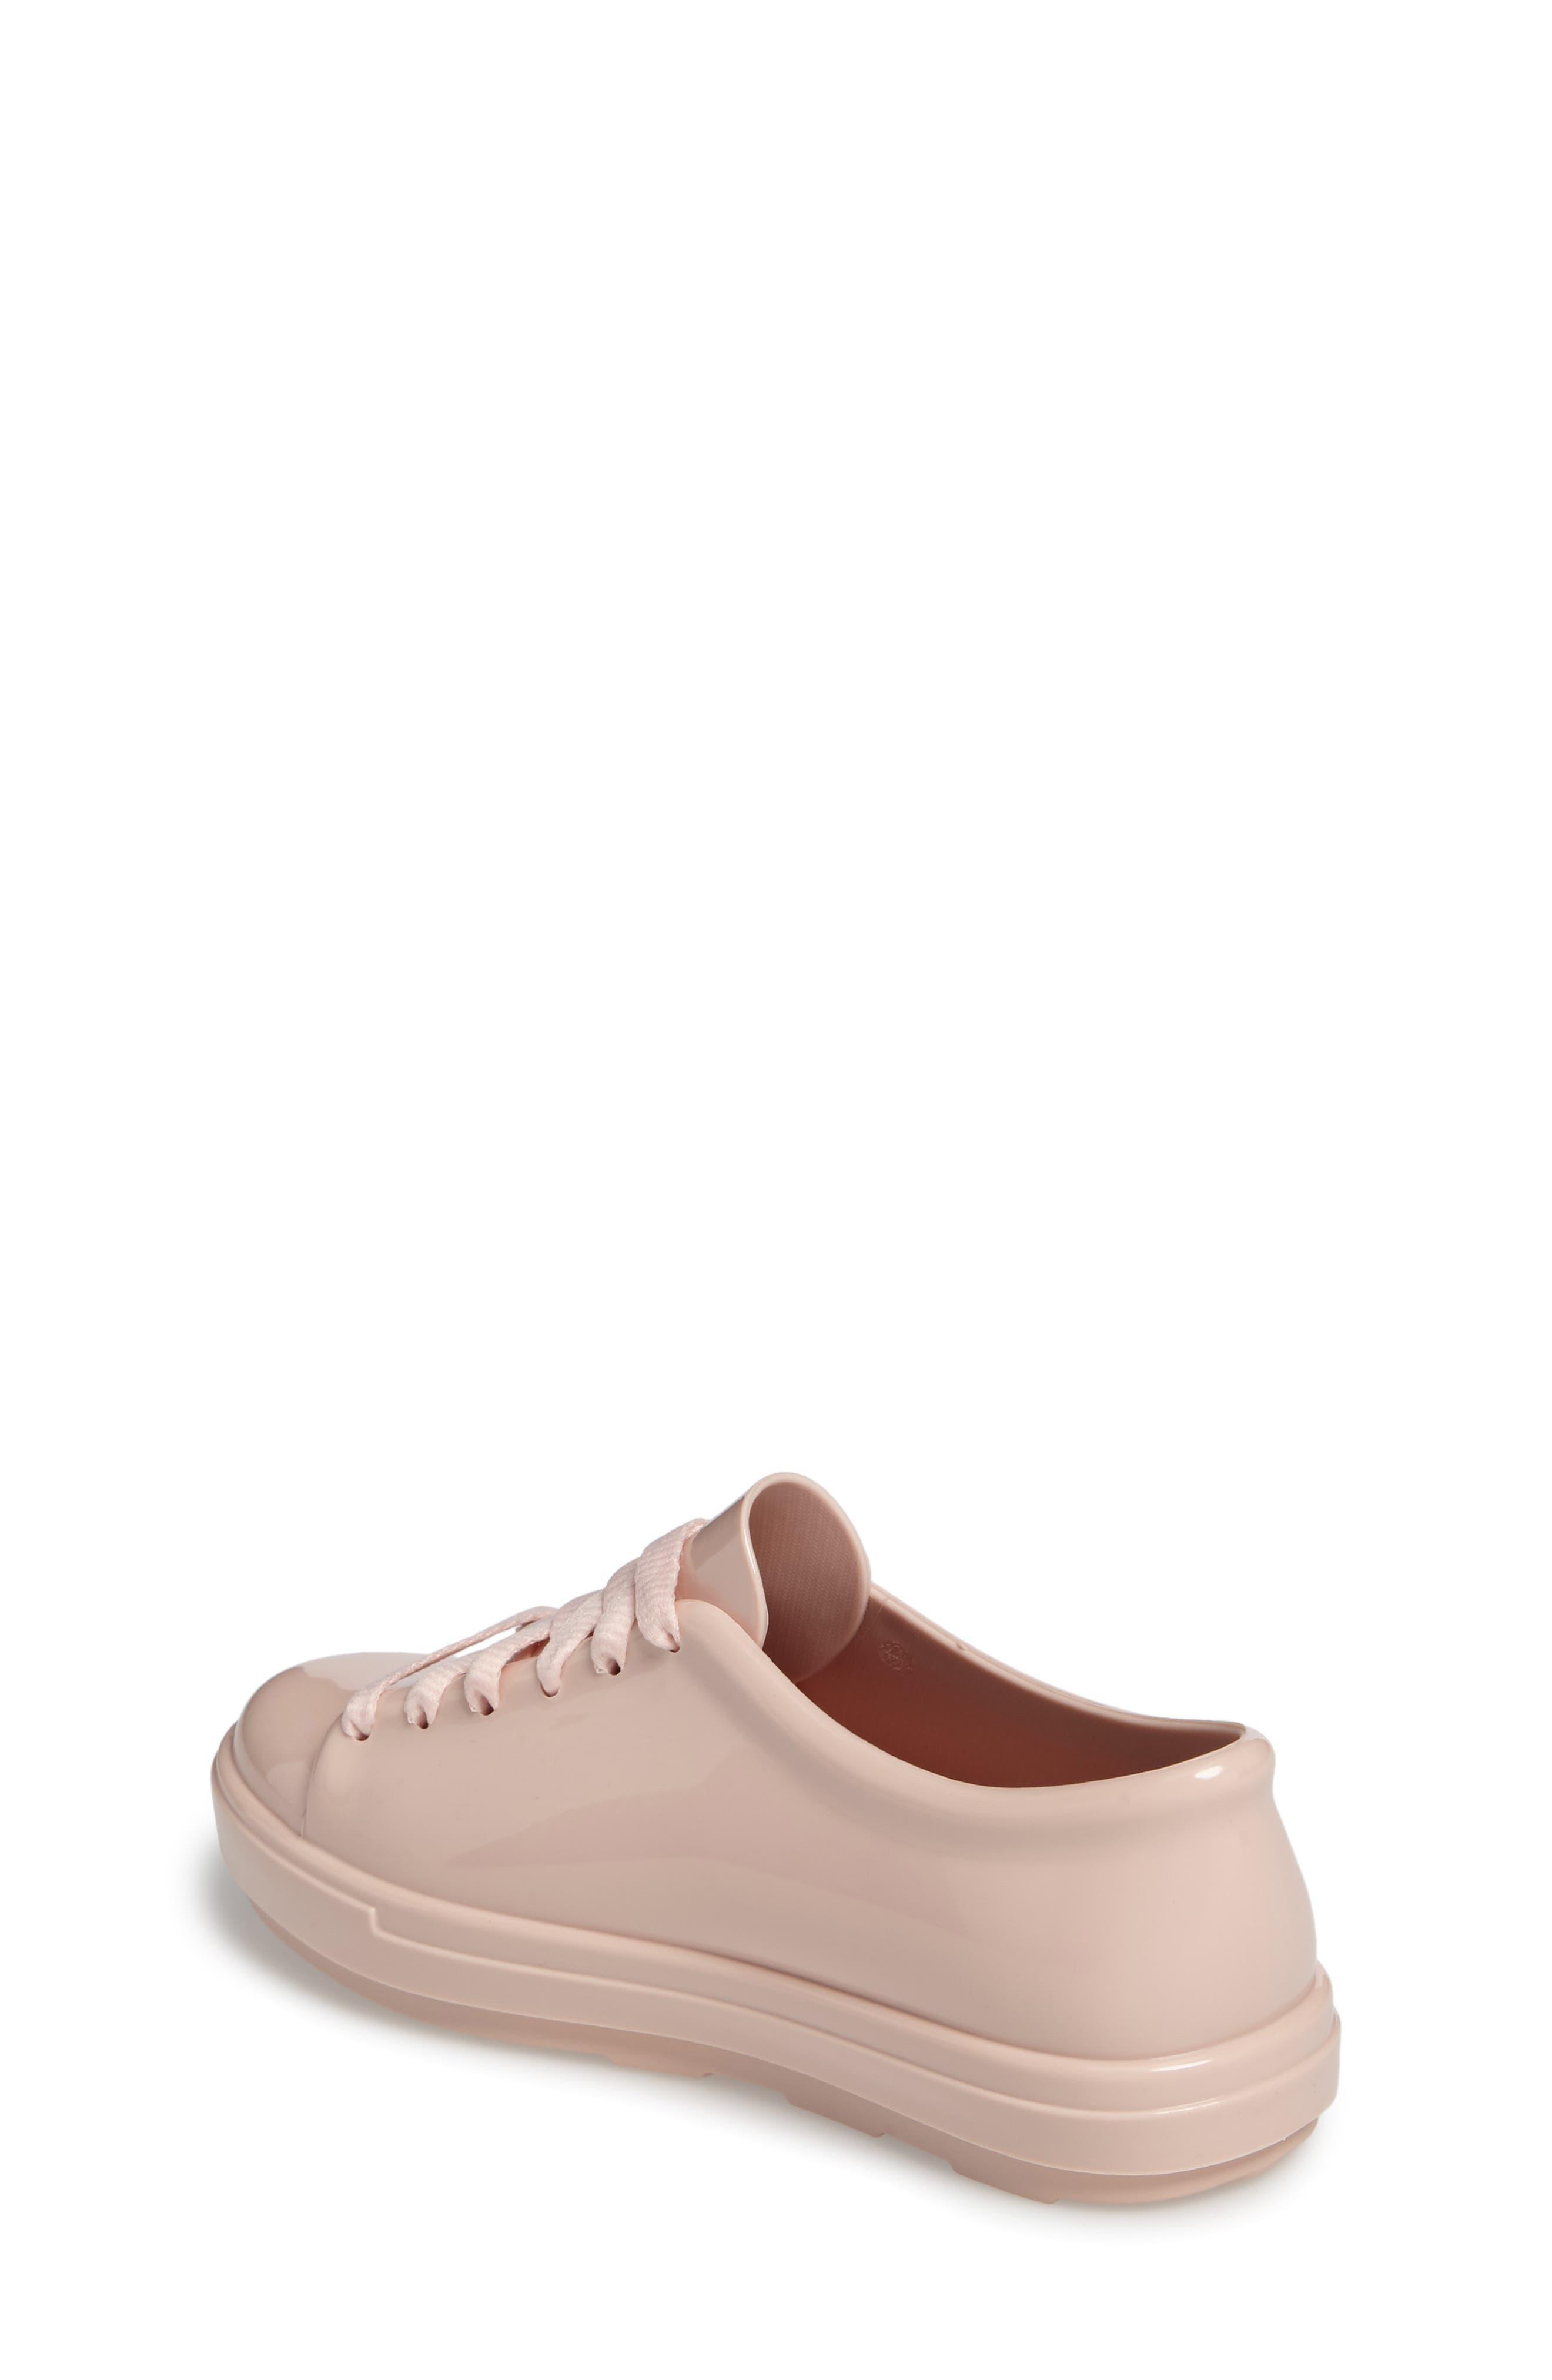 Mel Be Sneaker,                             Alternate thumbnail 5, color,